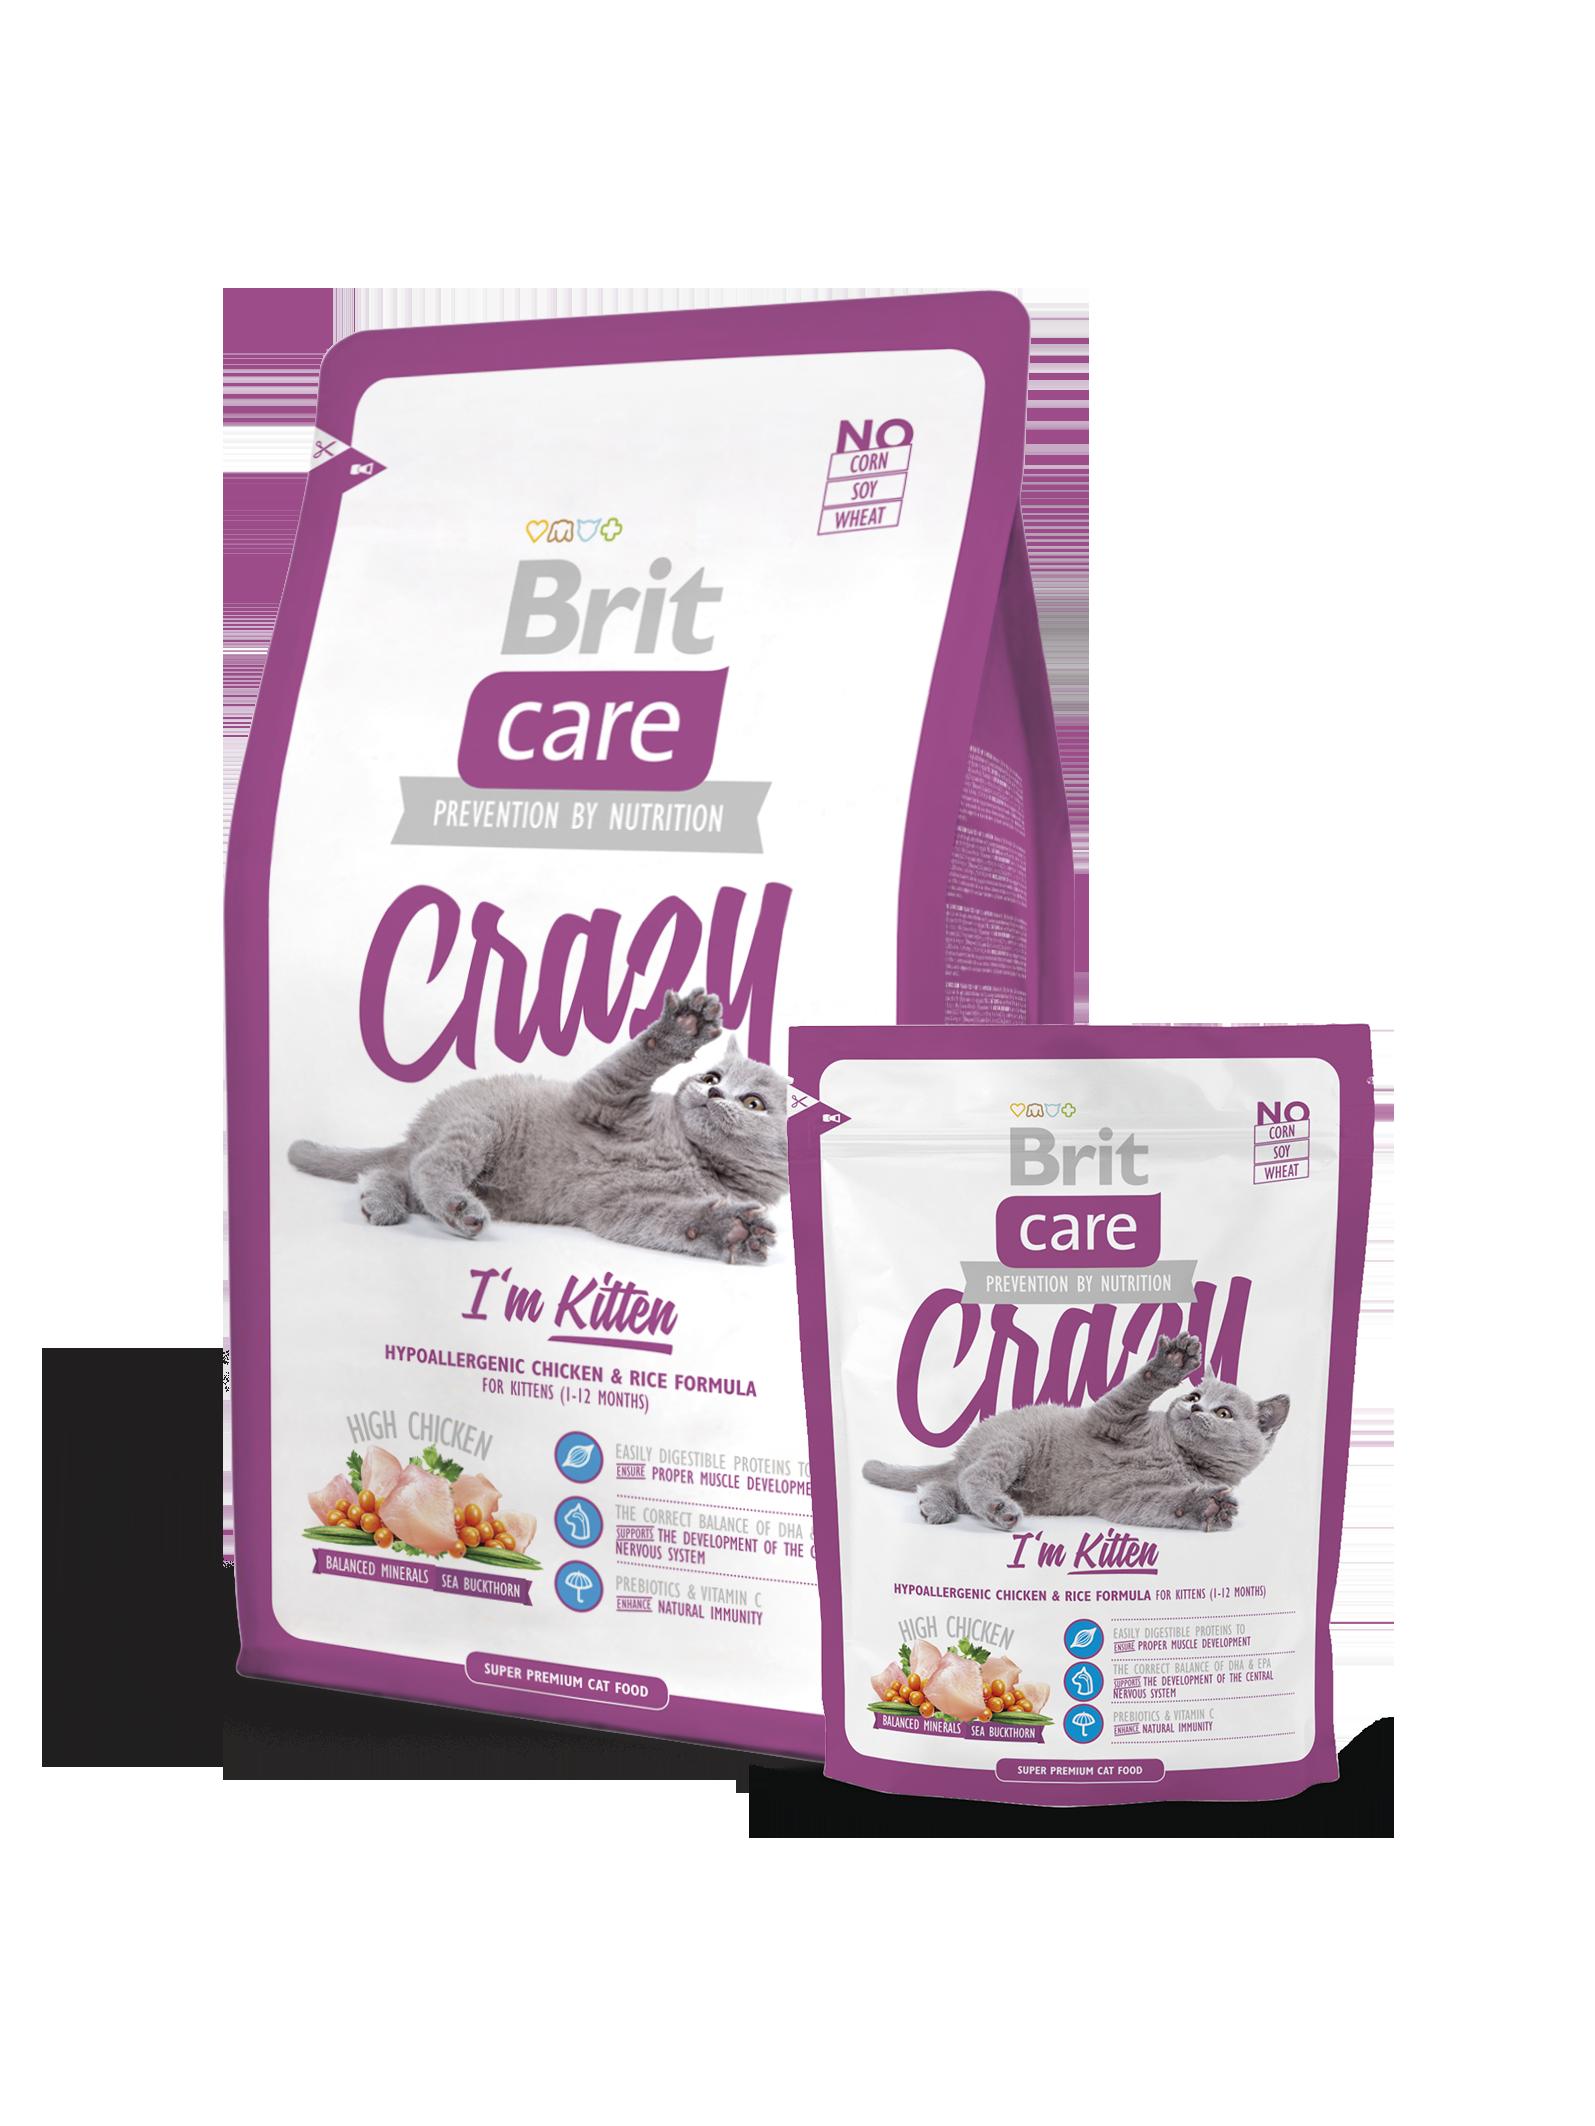 Brit Care Cat Crazy I'm Kitten 400g - Pet Food - Pet Store - Pet supplies